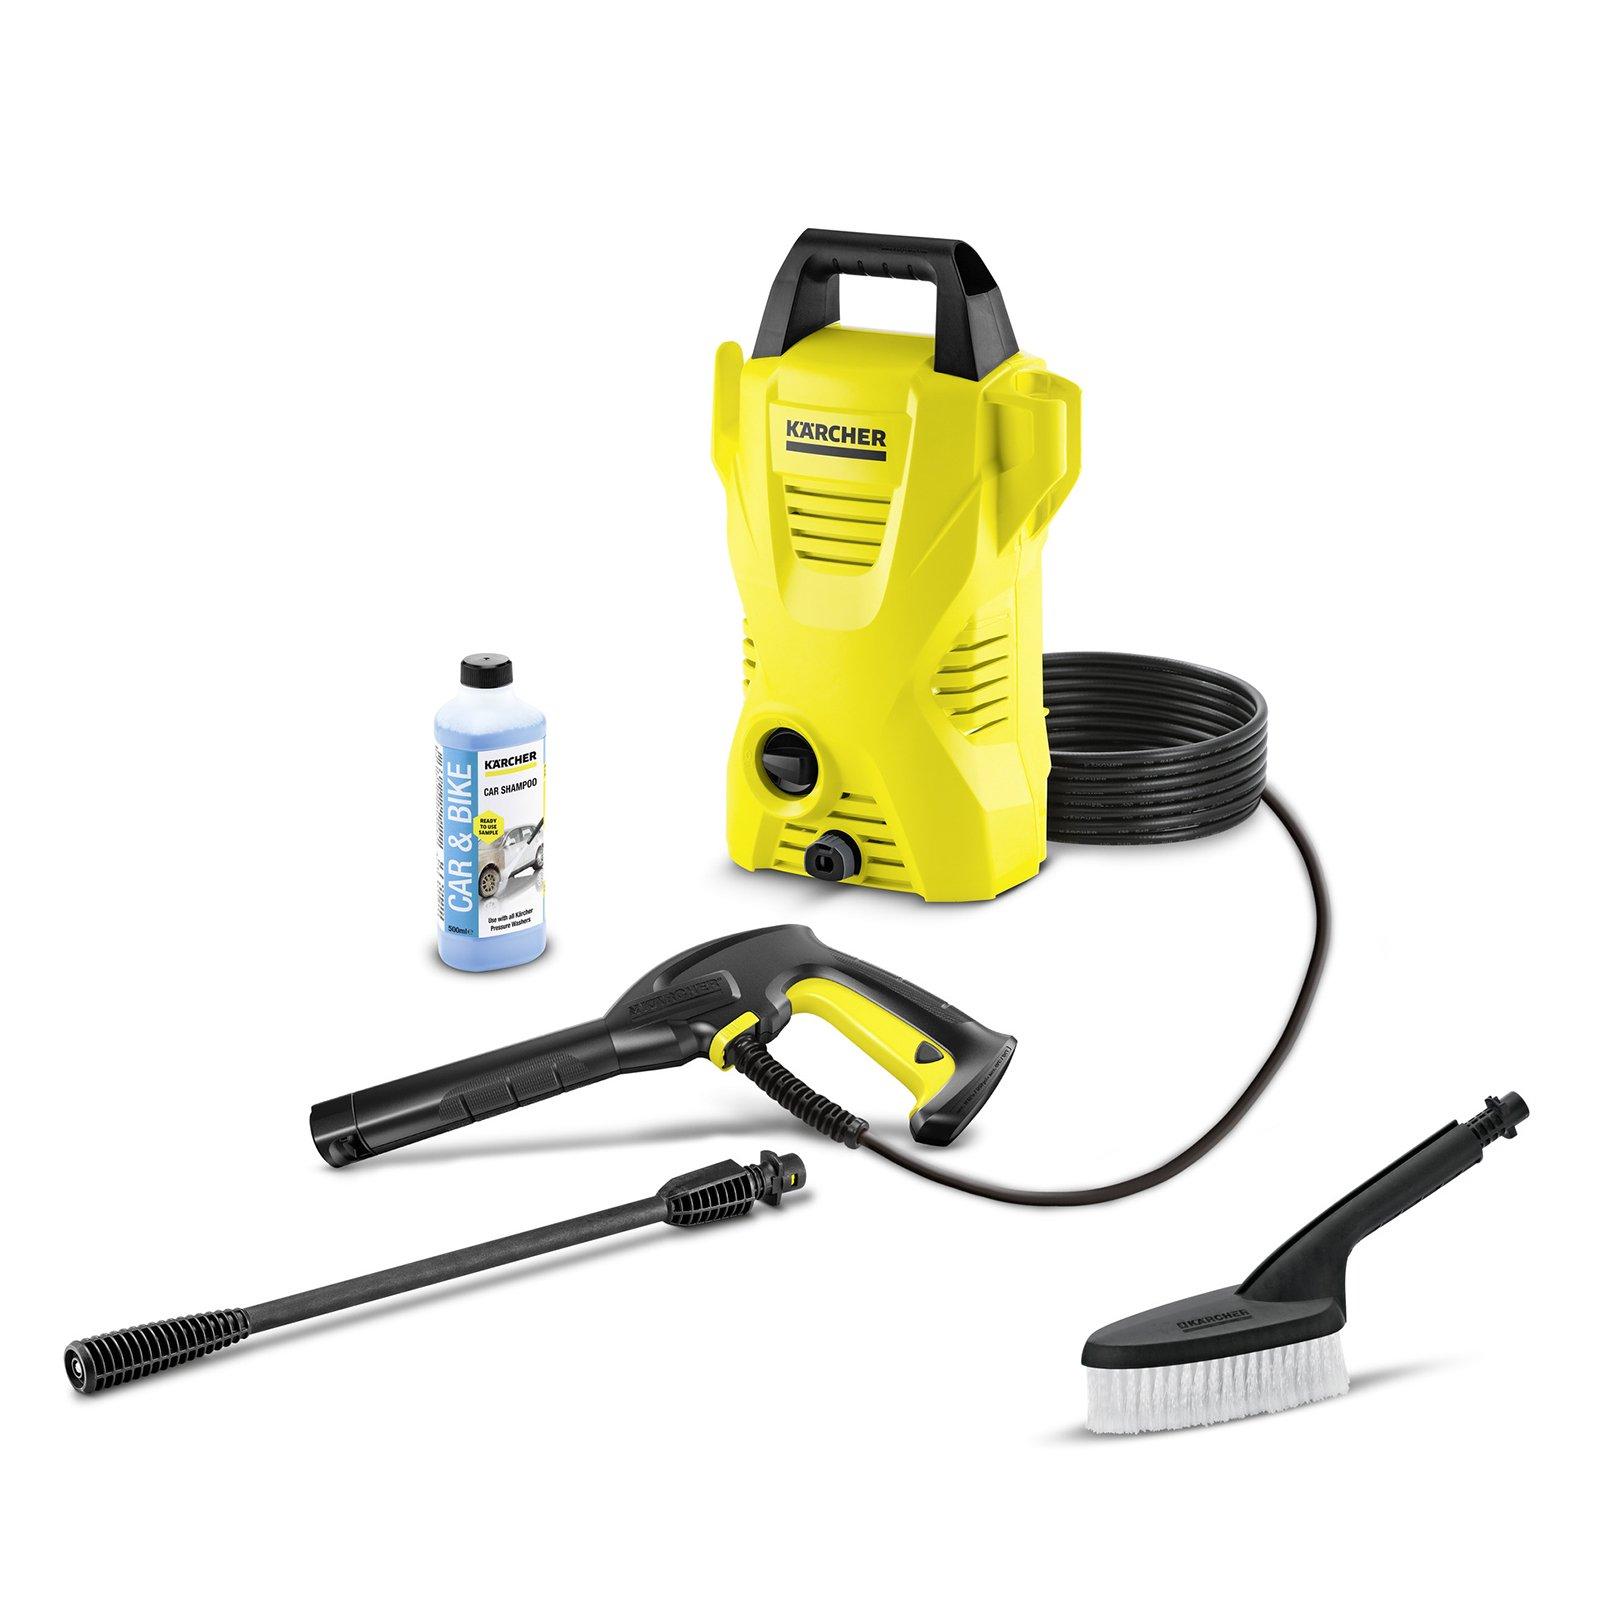 Karcher K2 Basic & Car Kit 1600psi Pressure Washer 1.602